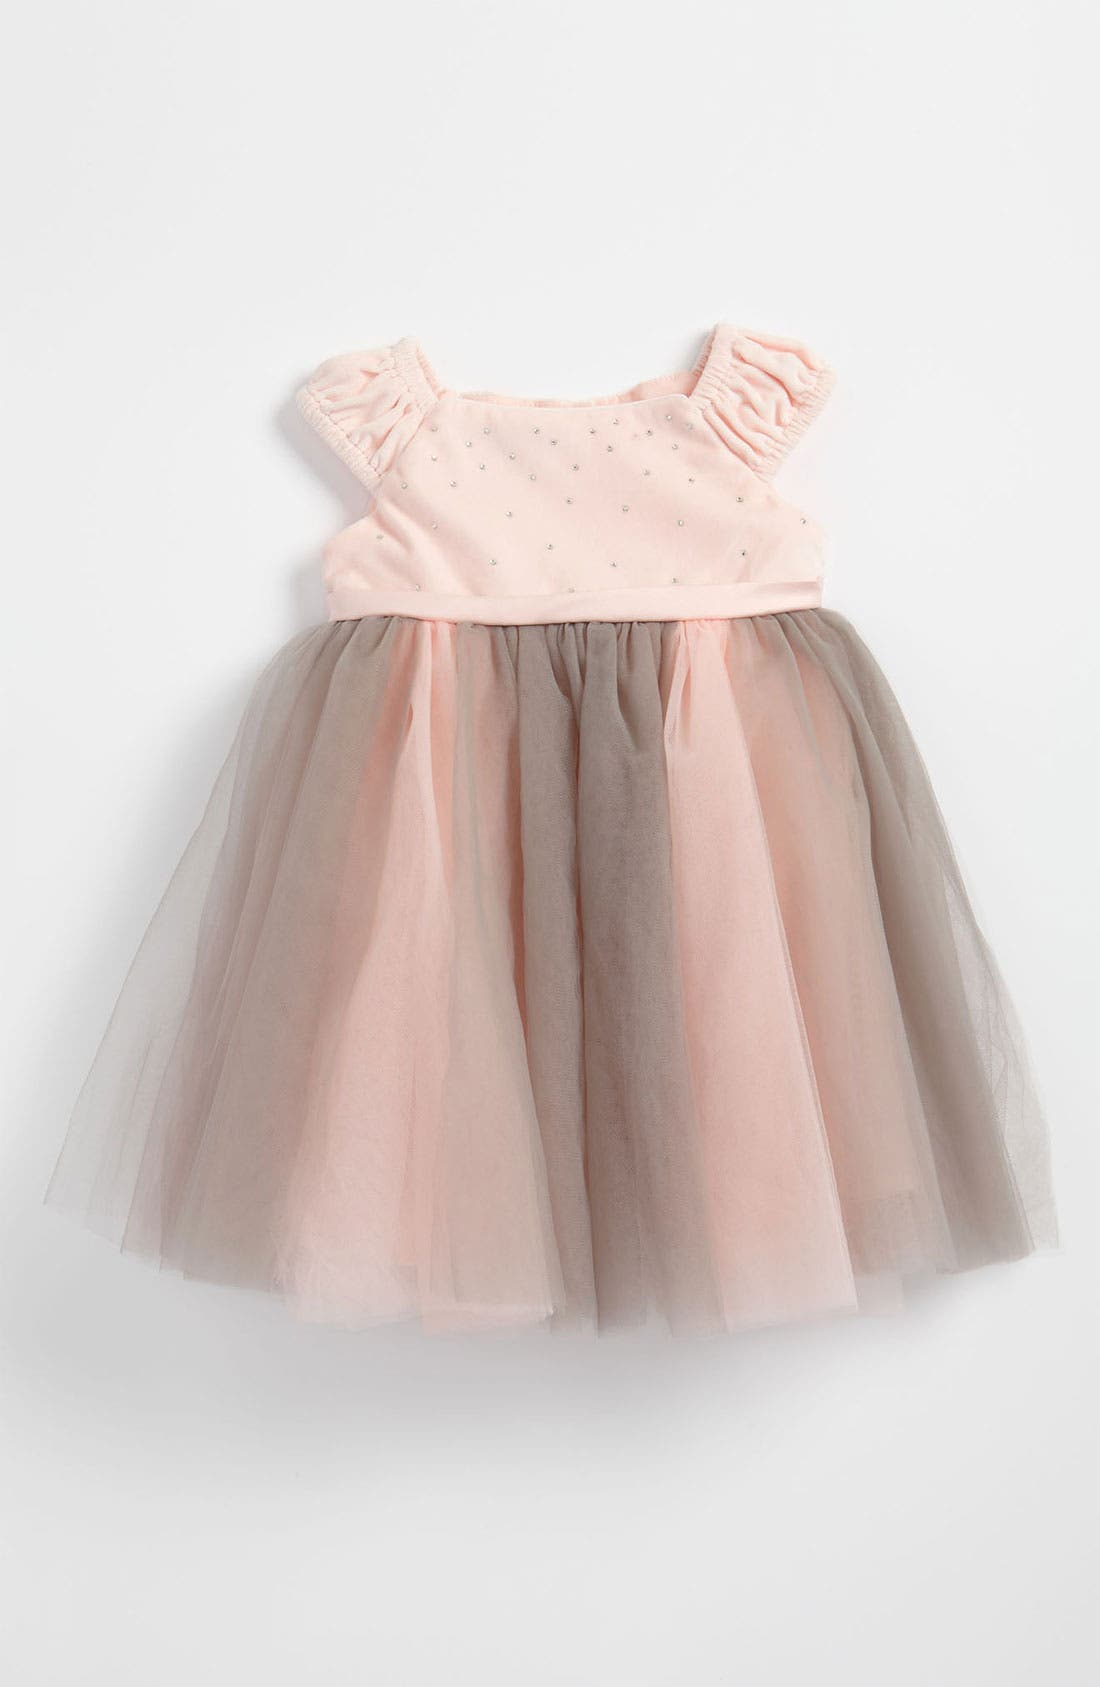 Main Image - Biscotti Tulle Ballerina Dress (Infant)